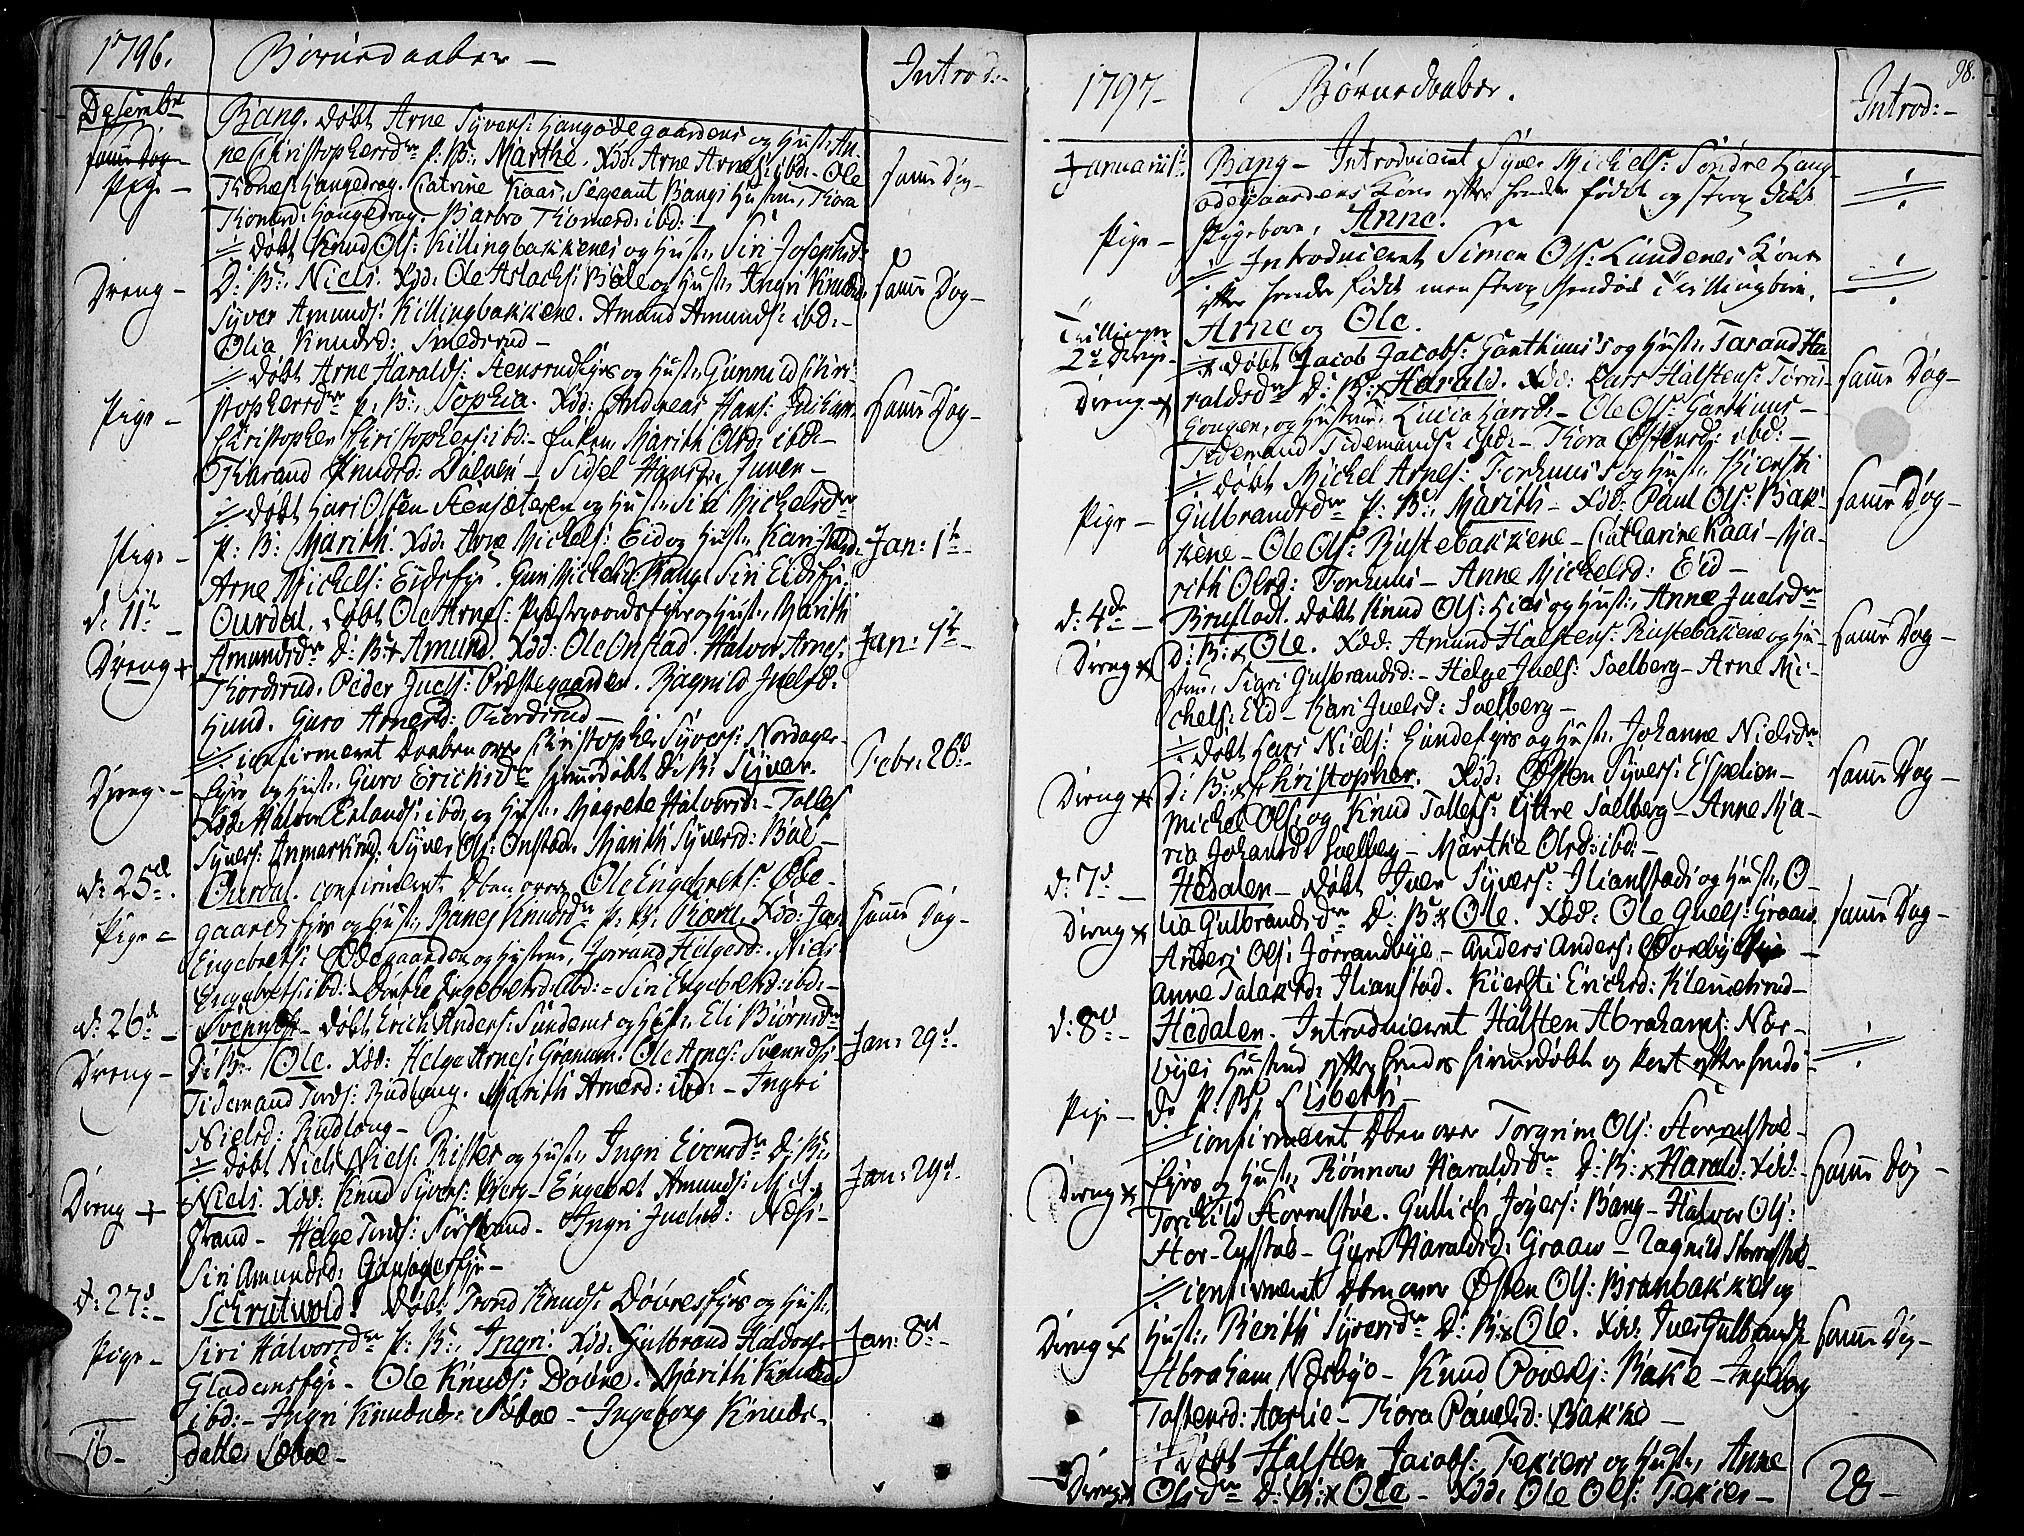 SAH, Aurdal prestekontor, Ministerialbok nr. 6, 1781-1804, s. 98